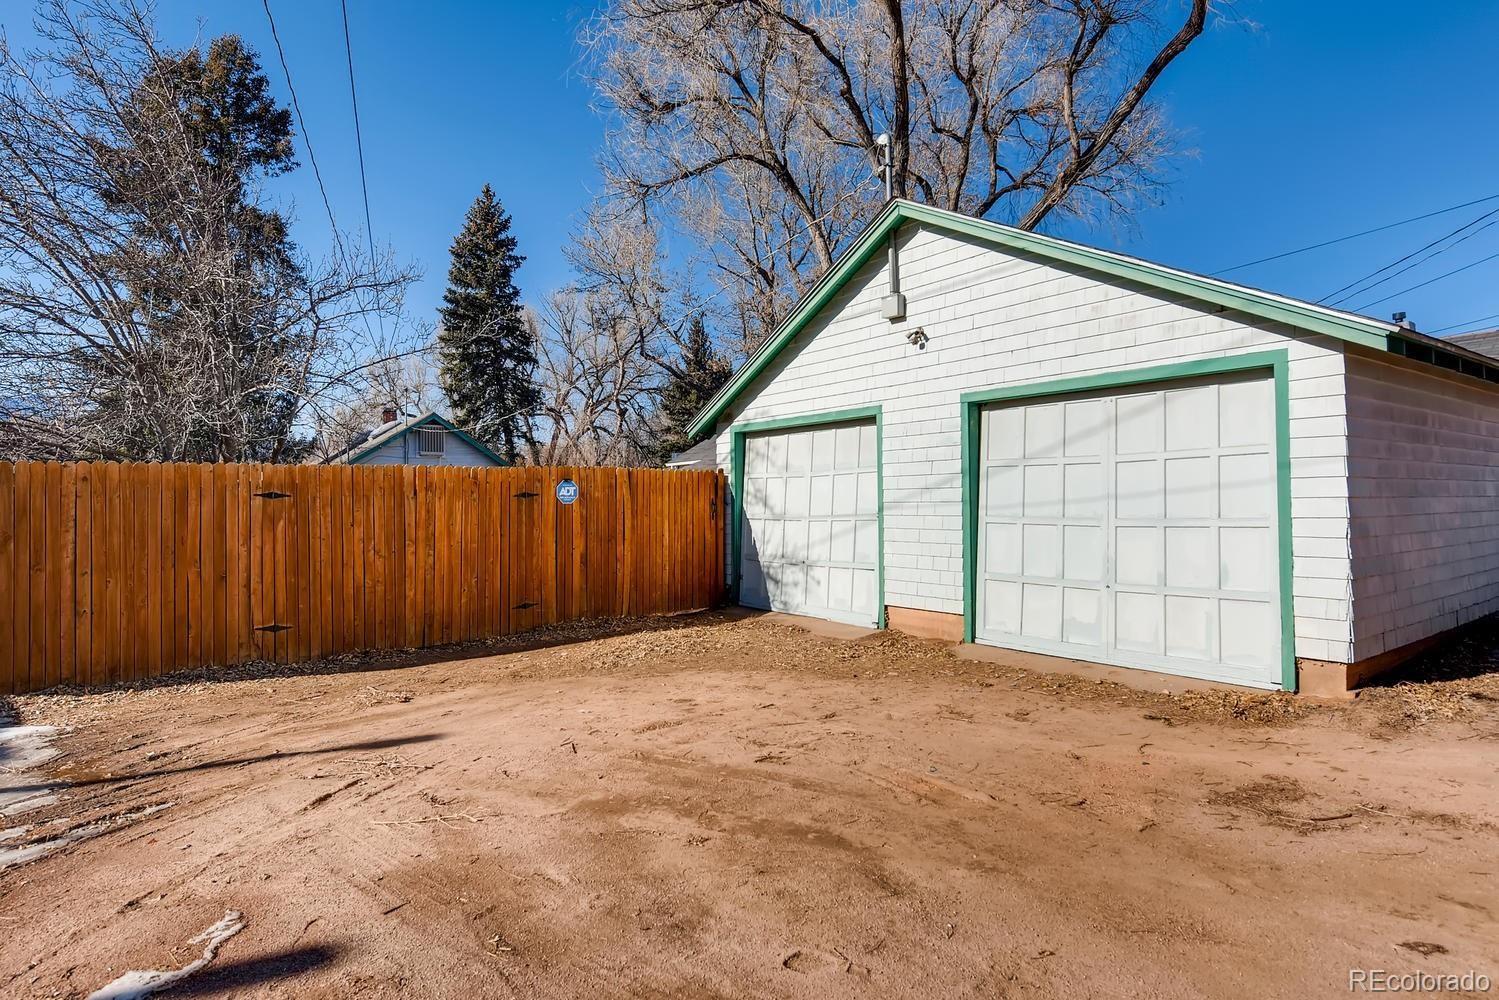 MLS# 5367790 - 18 - 319 N Foote Avenue, Colorado Springs, CO 80909